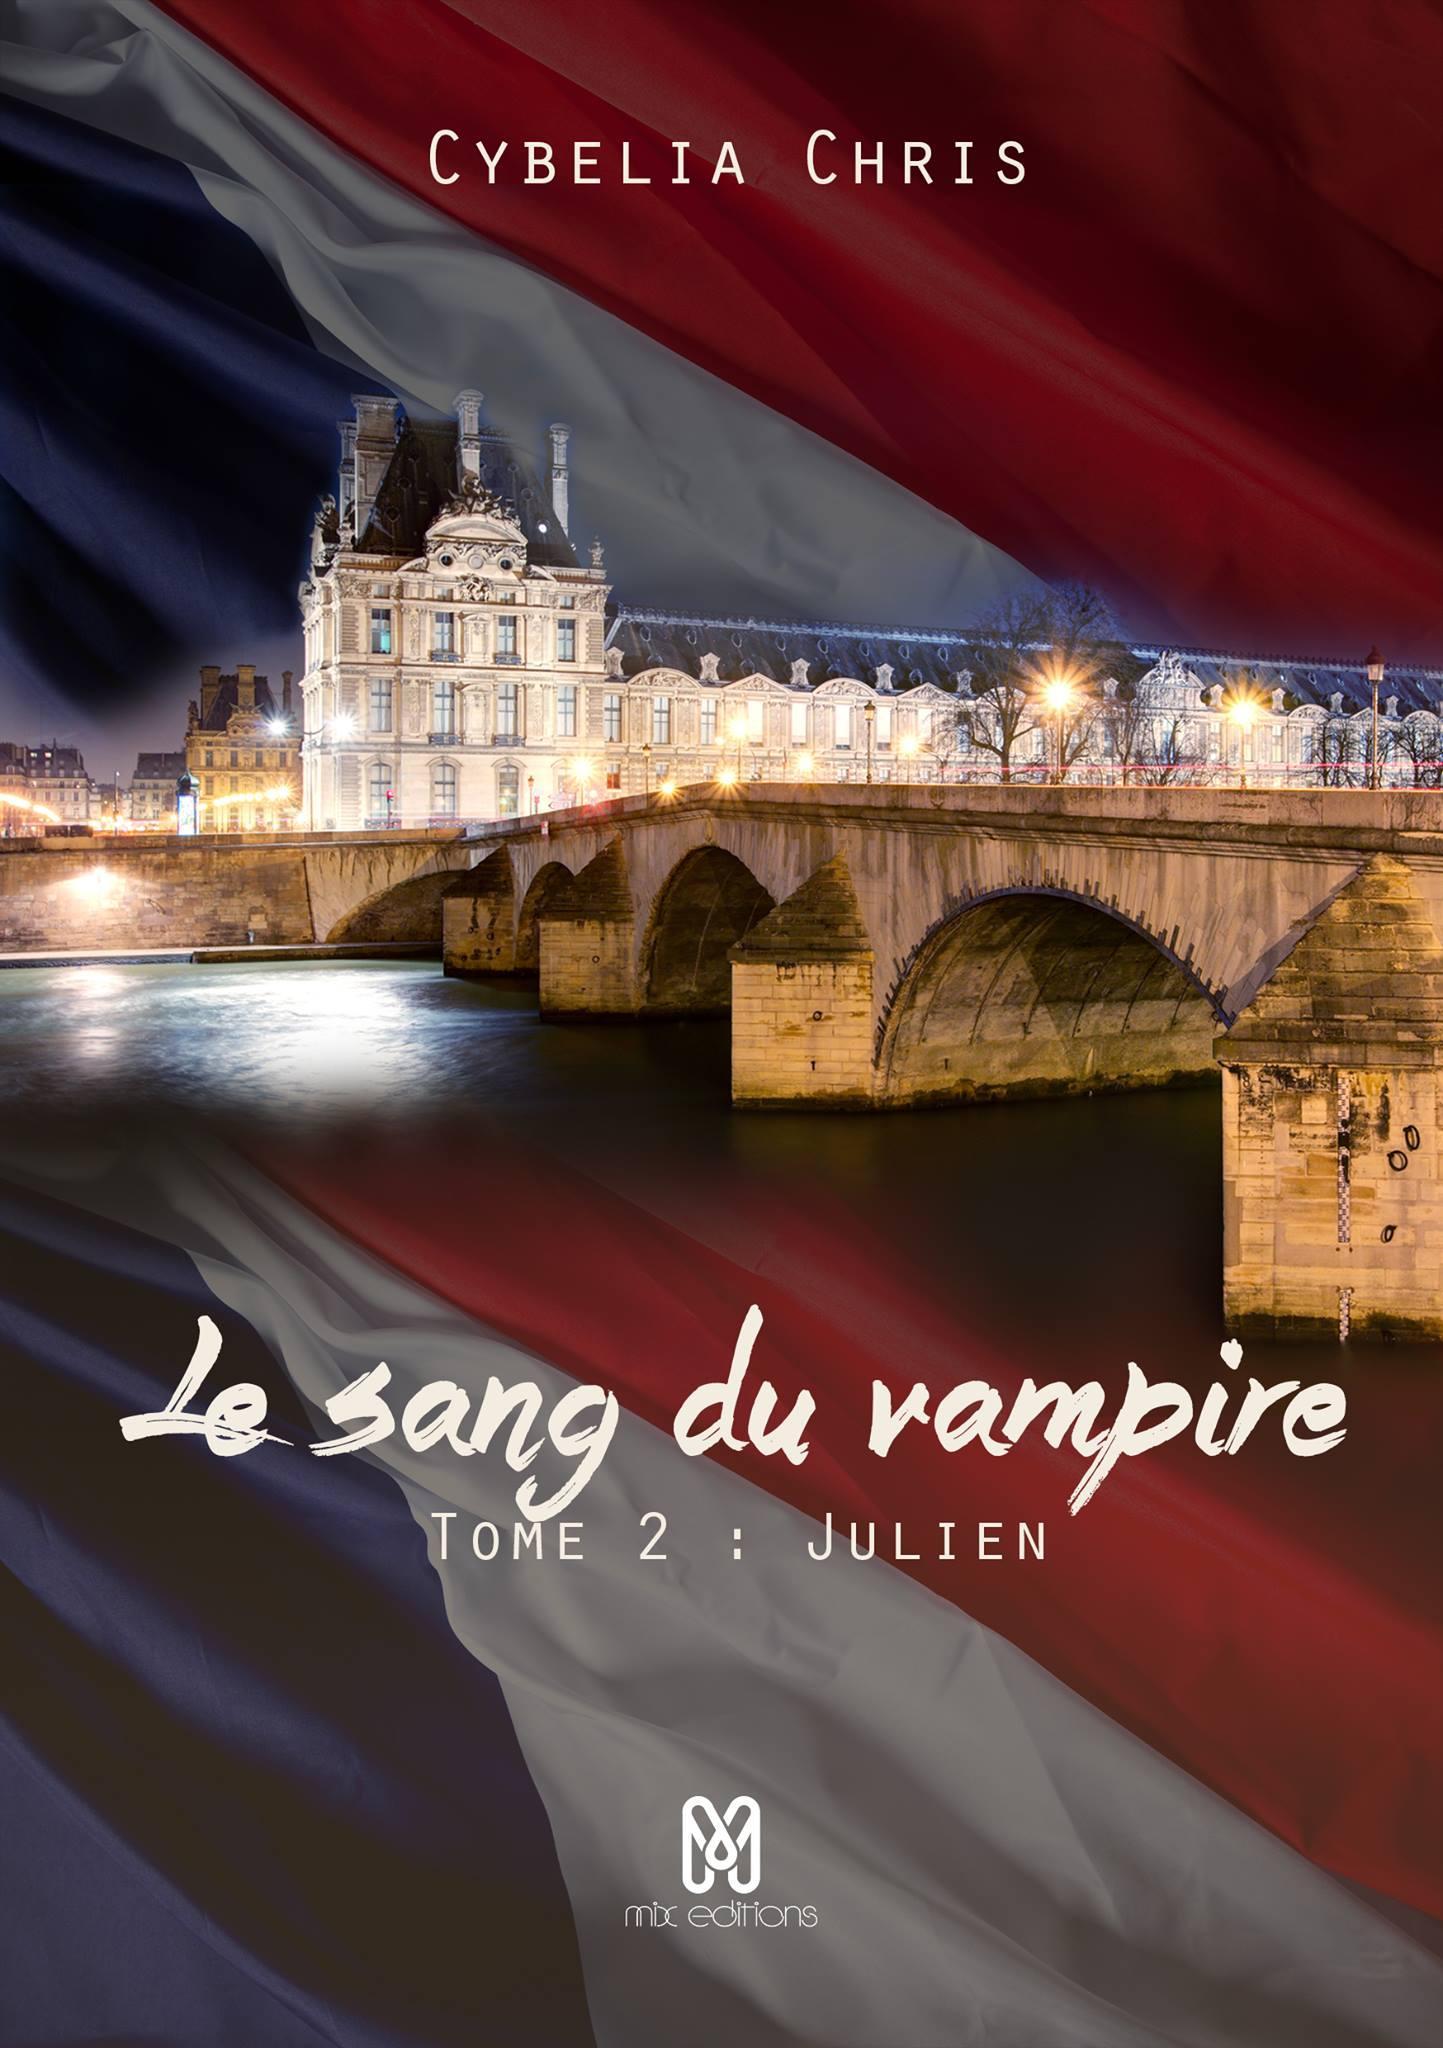 Le sang du Vampire Tome 2, JULIEN